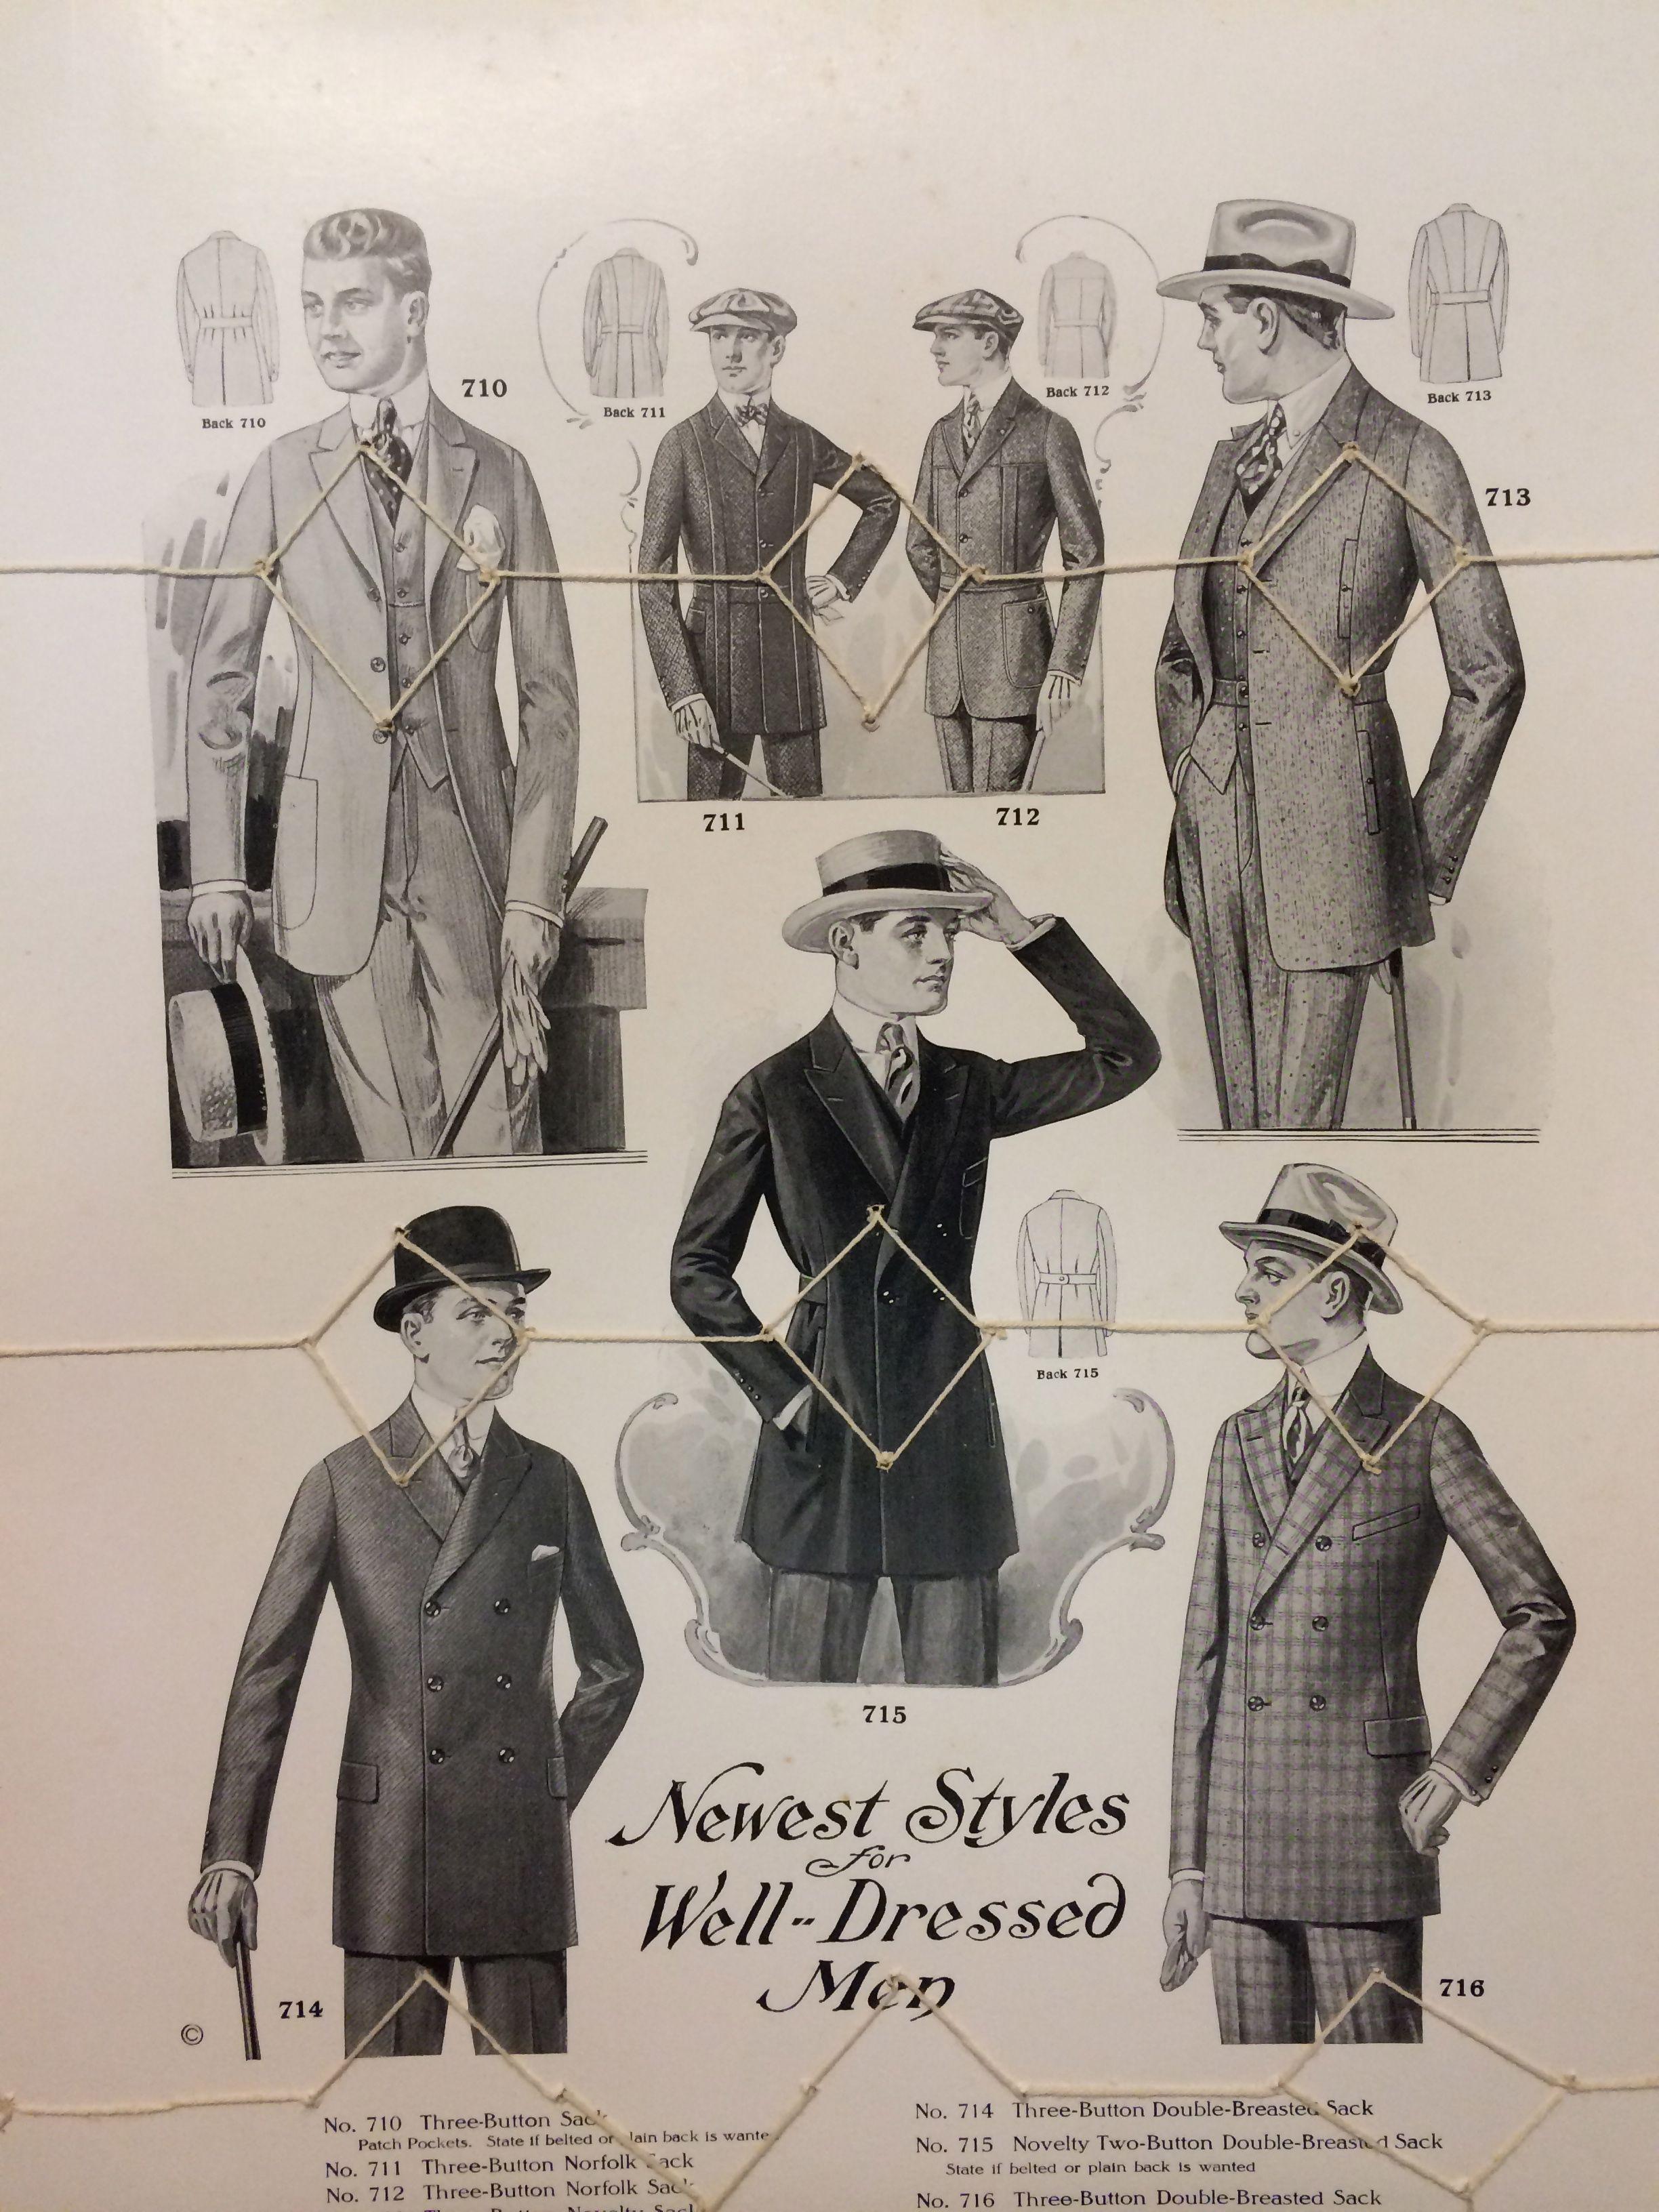 Vintage Men Hat Suit In 2020 Vintage Clothing Men Mens Fashion Classic Mens Fashion Illustration